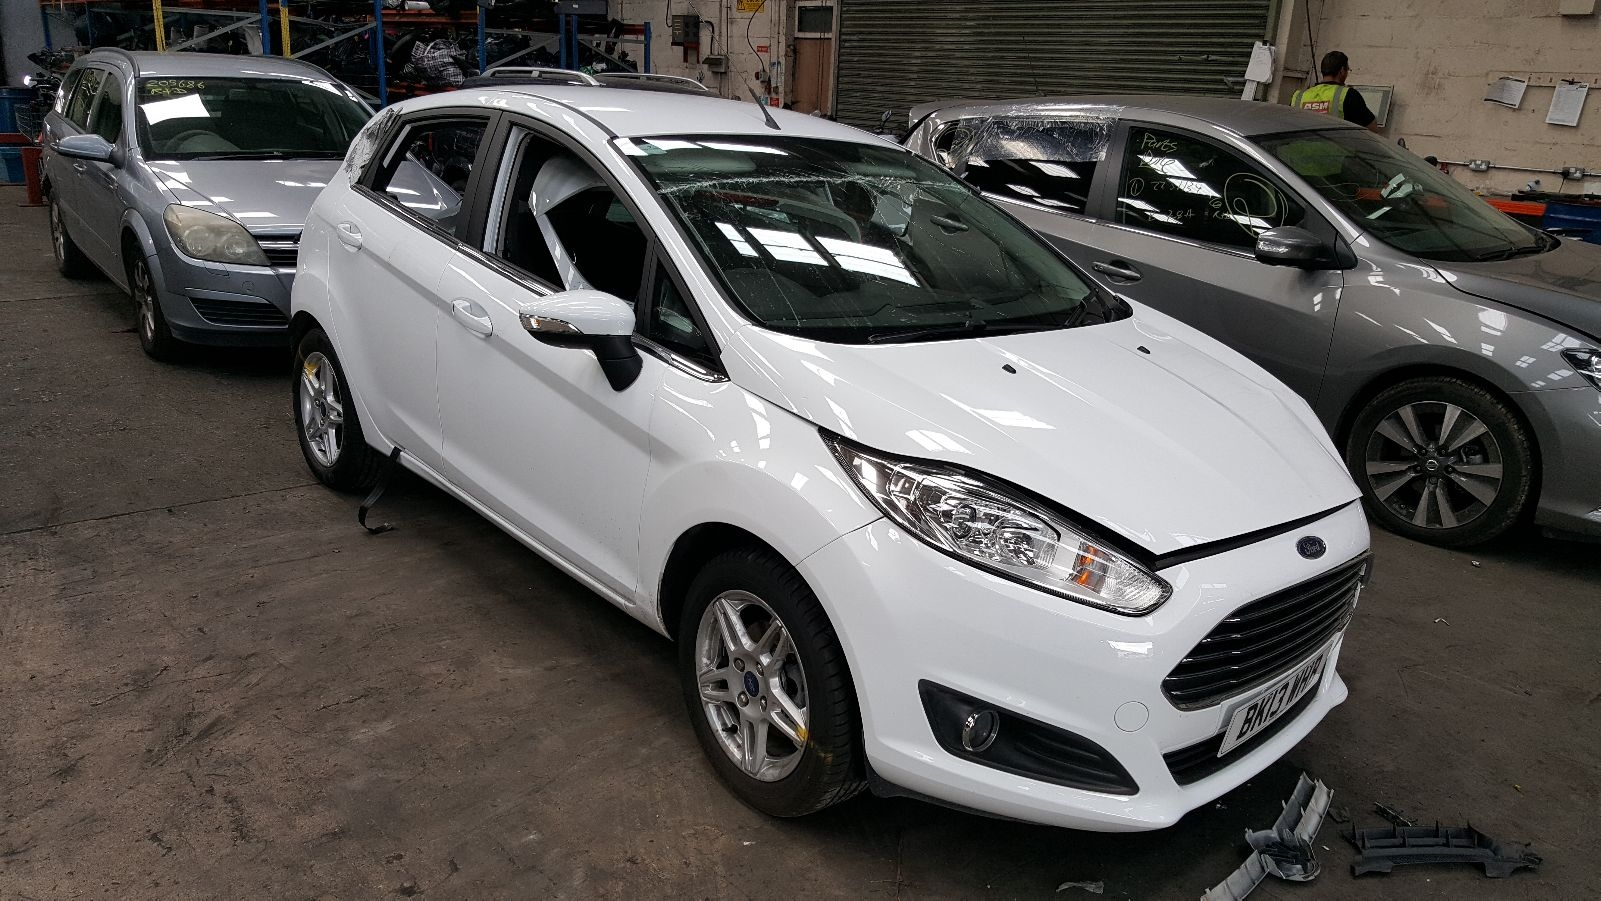 Image for a 2013 Ford Fiesta 1.6 Petrol IQJA Engine